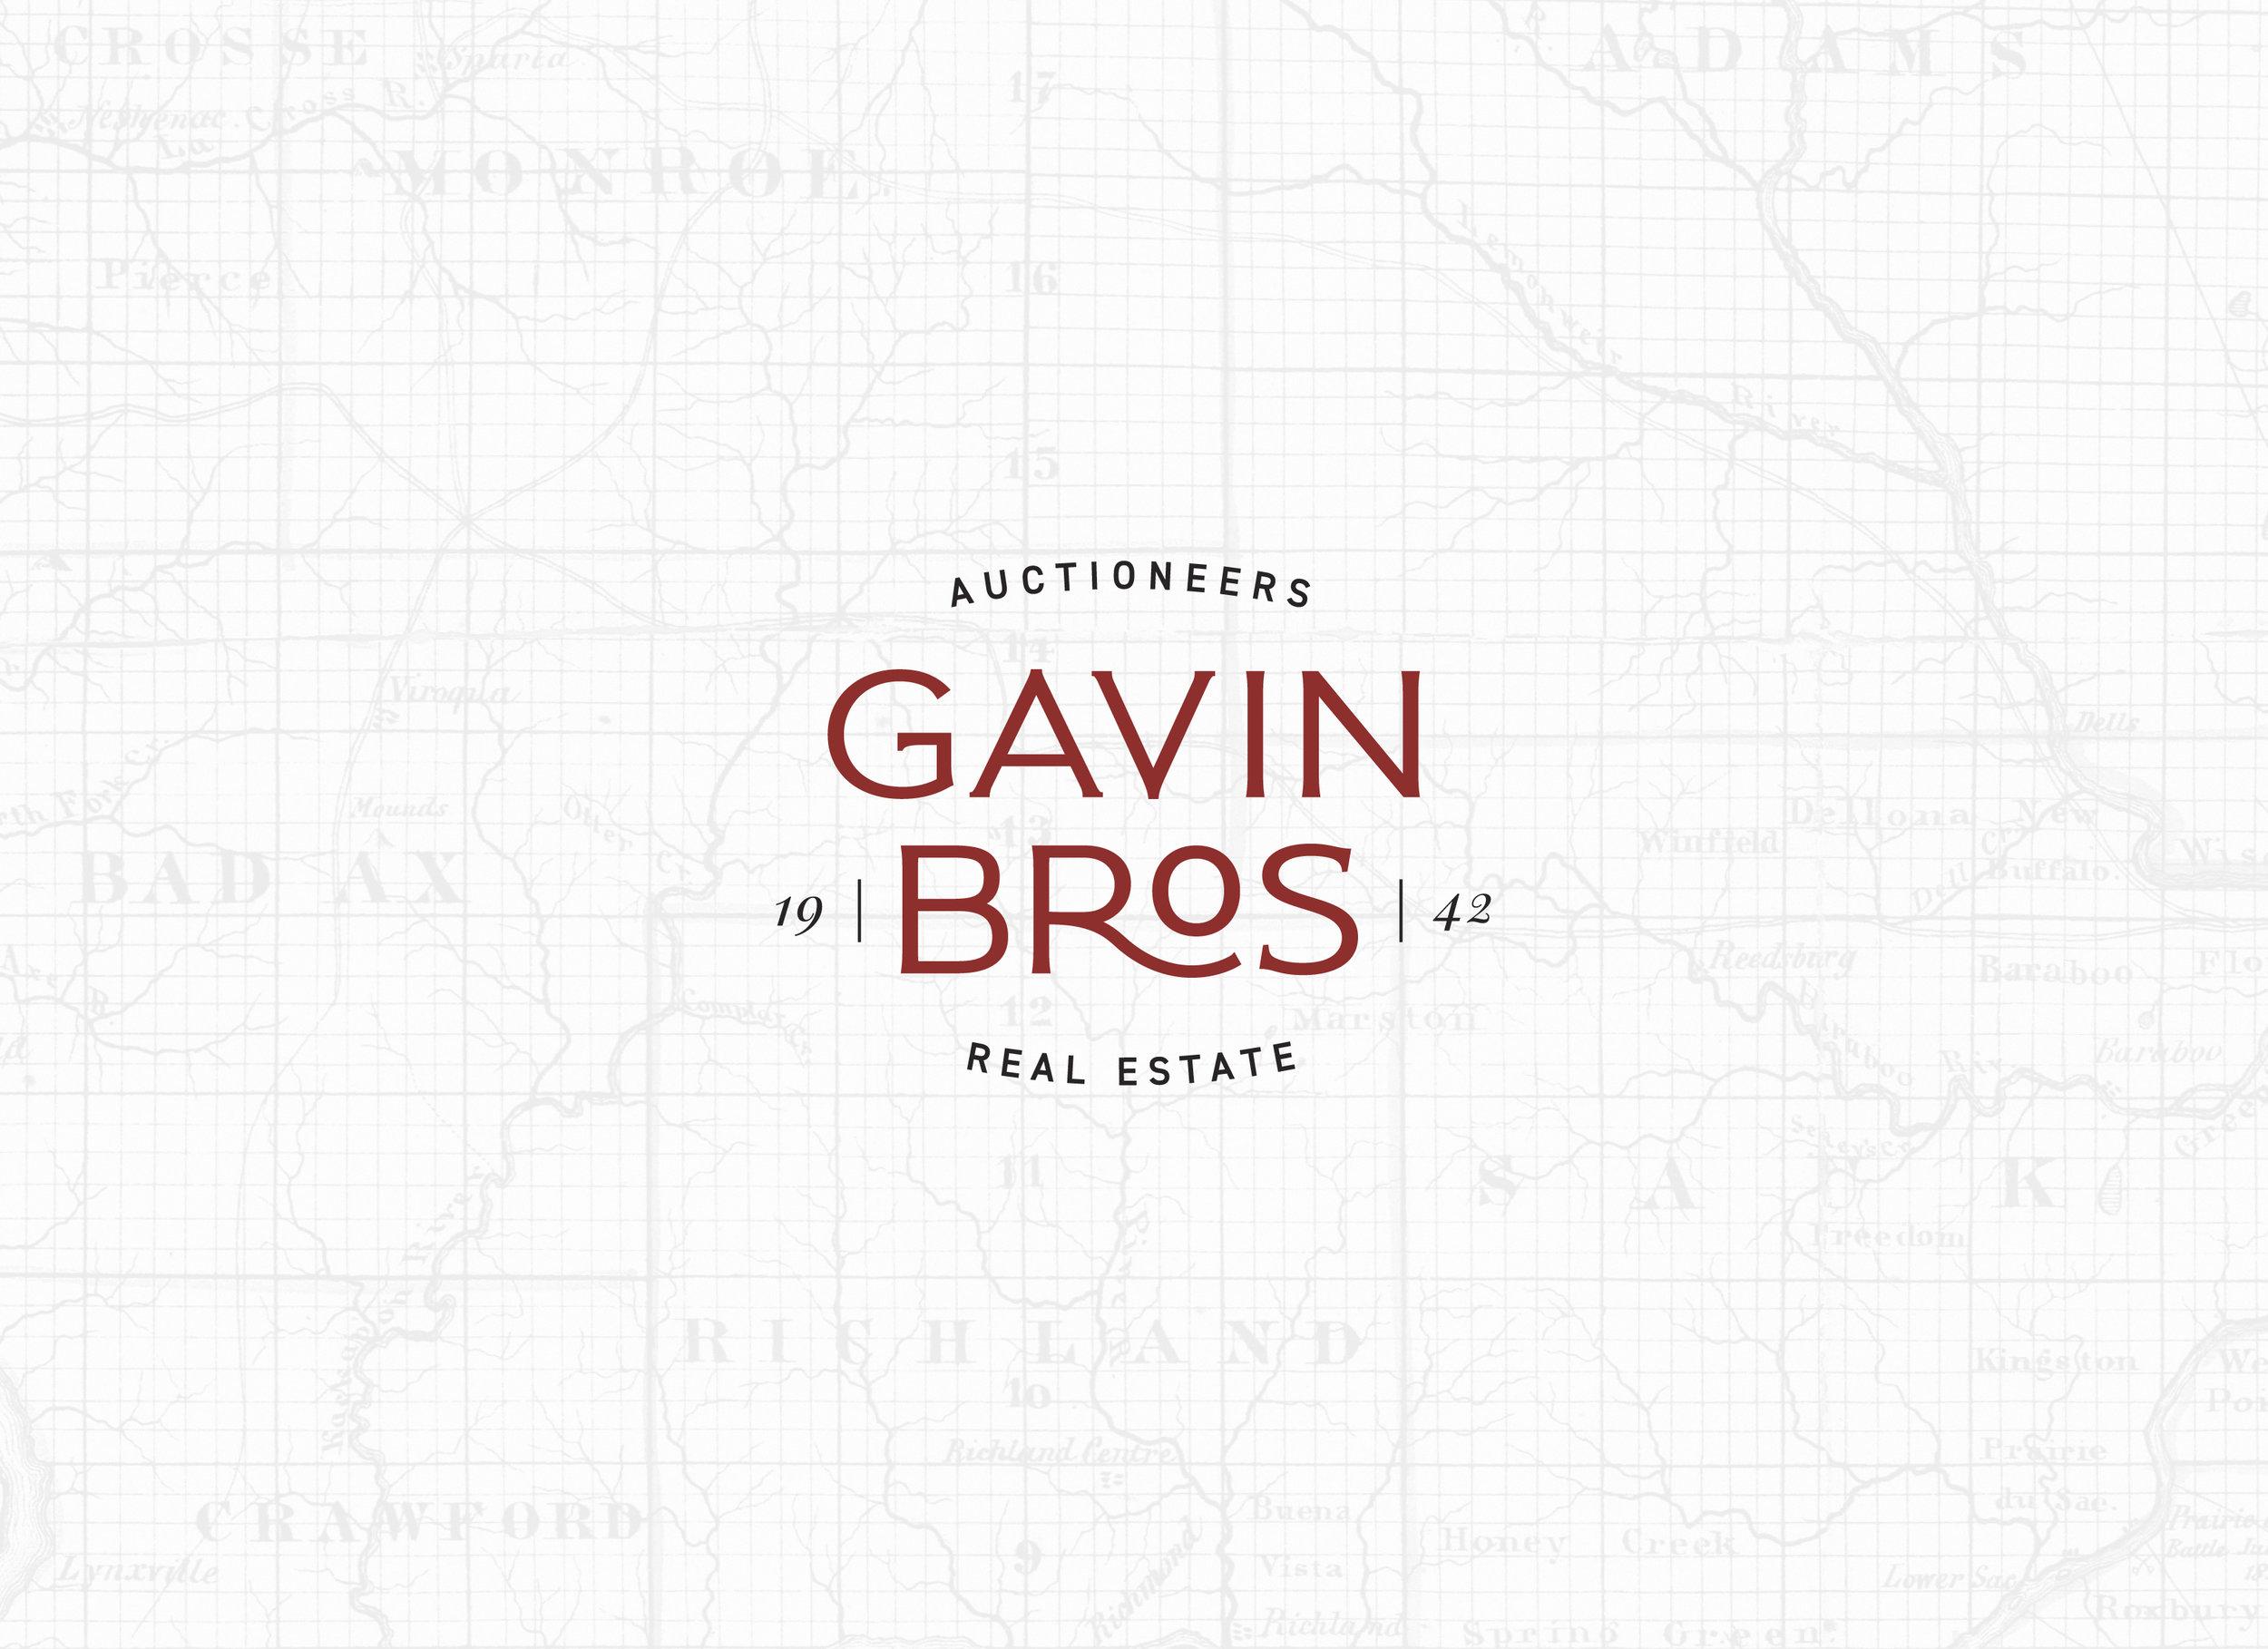 GBros_portfolio3.jpg